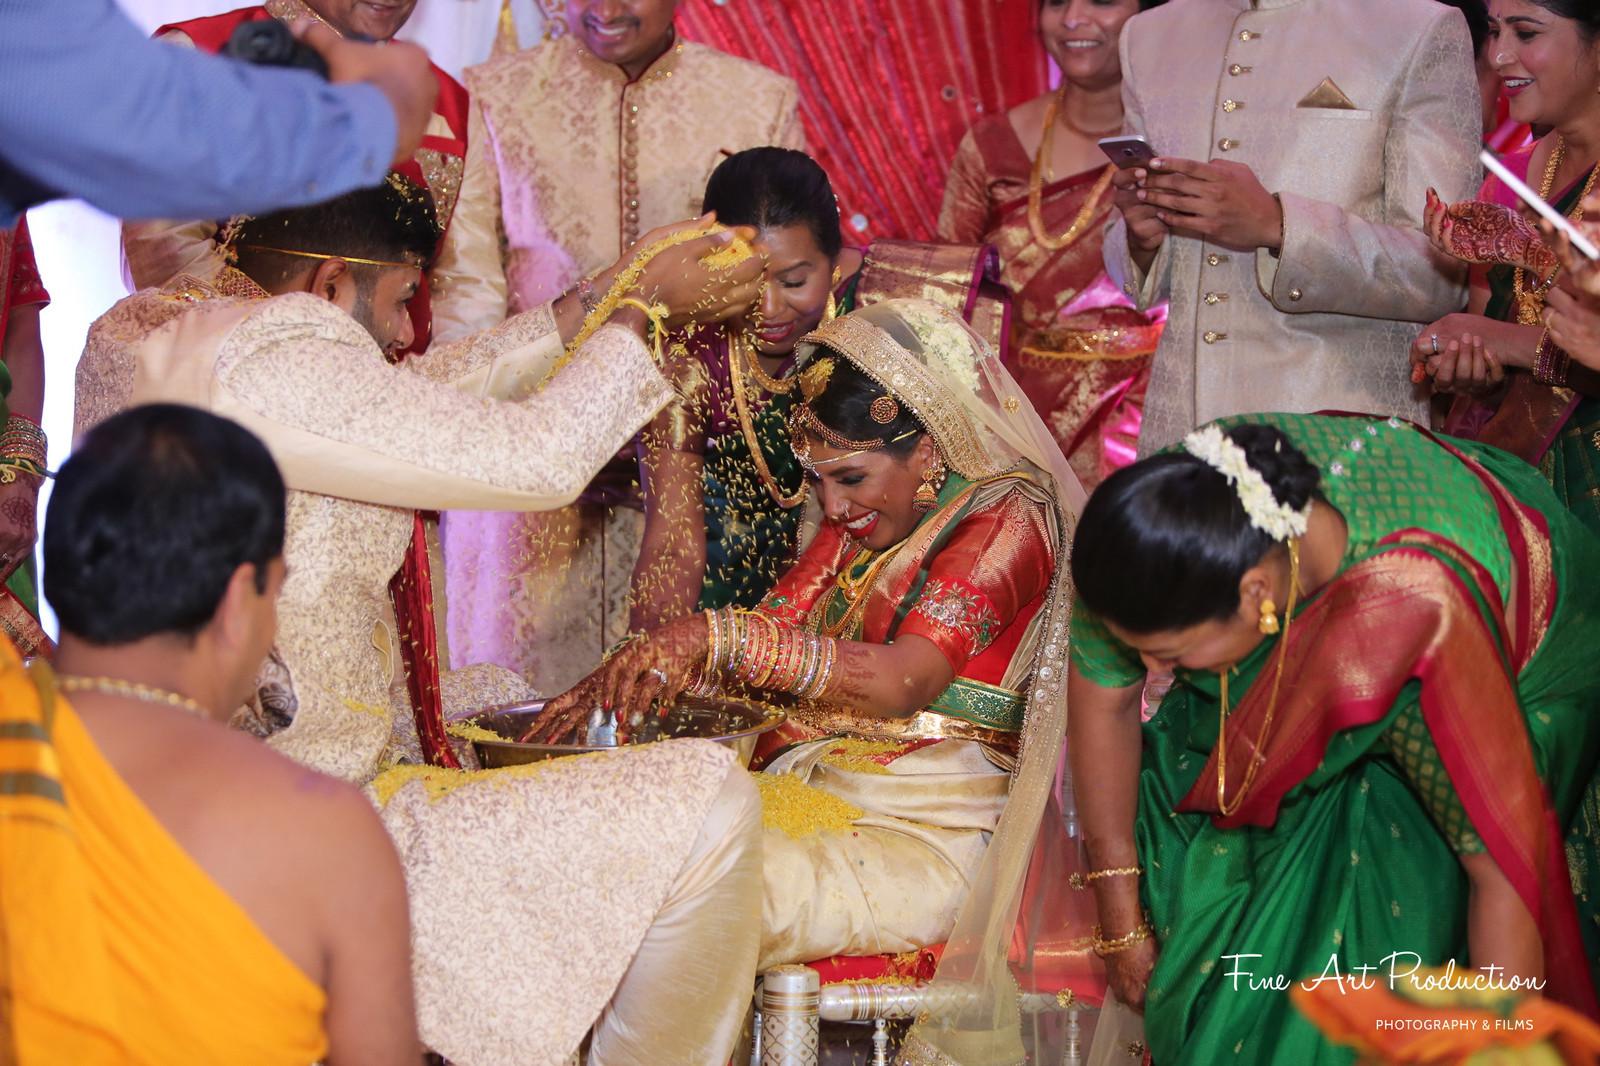 e2c9650180 South Indian Wedding Photographer | New Jersey | Fine Art Production